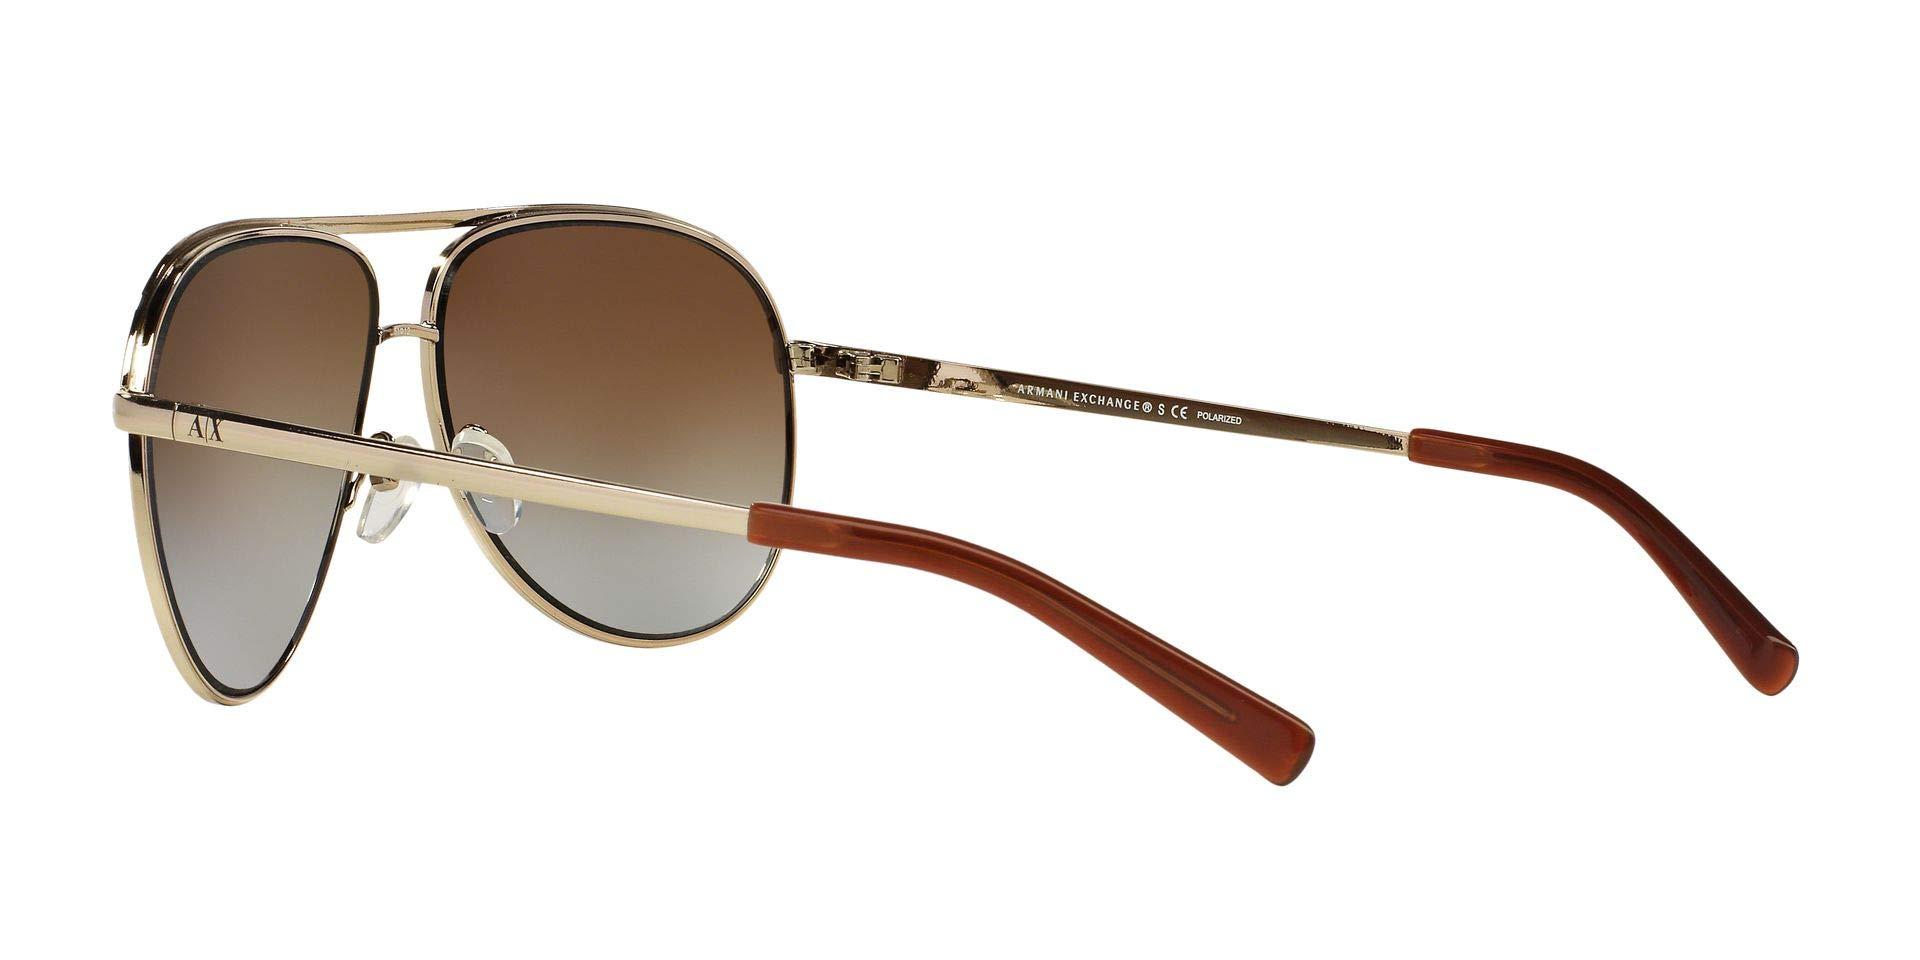 Armani Exchange Metal Unisex Polarized Aviator Sunglasses, Light Gold/Dark Brown, 61 mm by A|X Armani Exchange (Image #6)